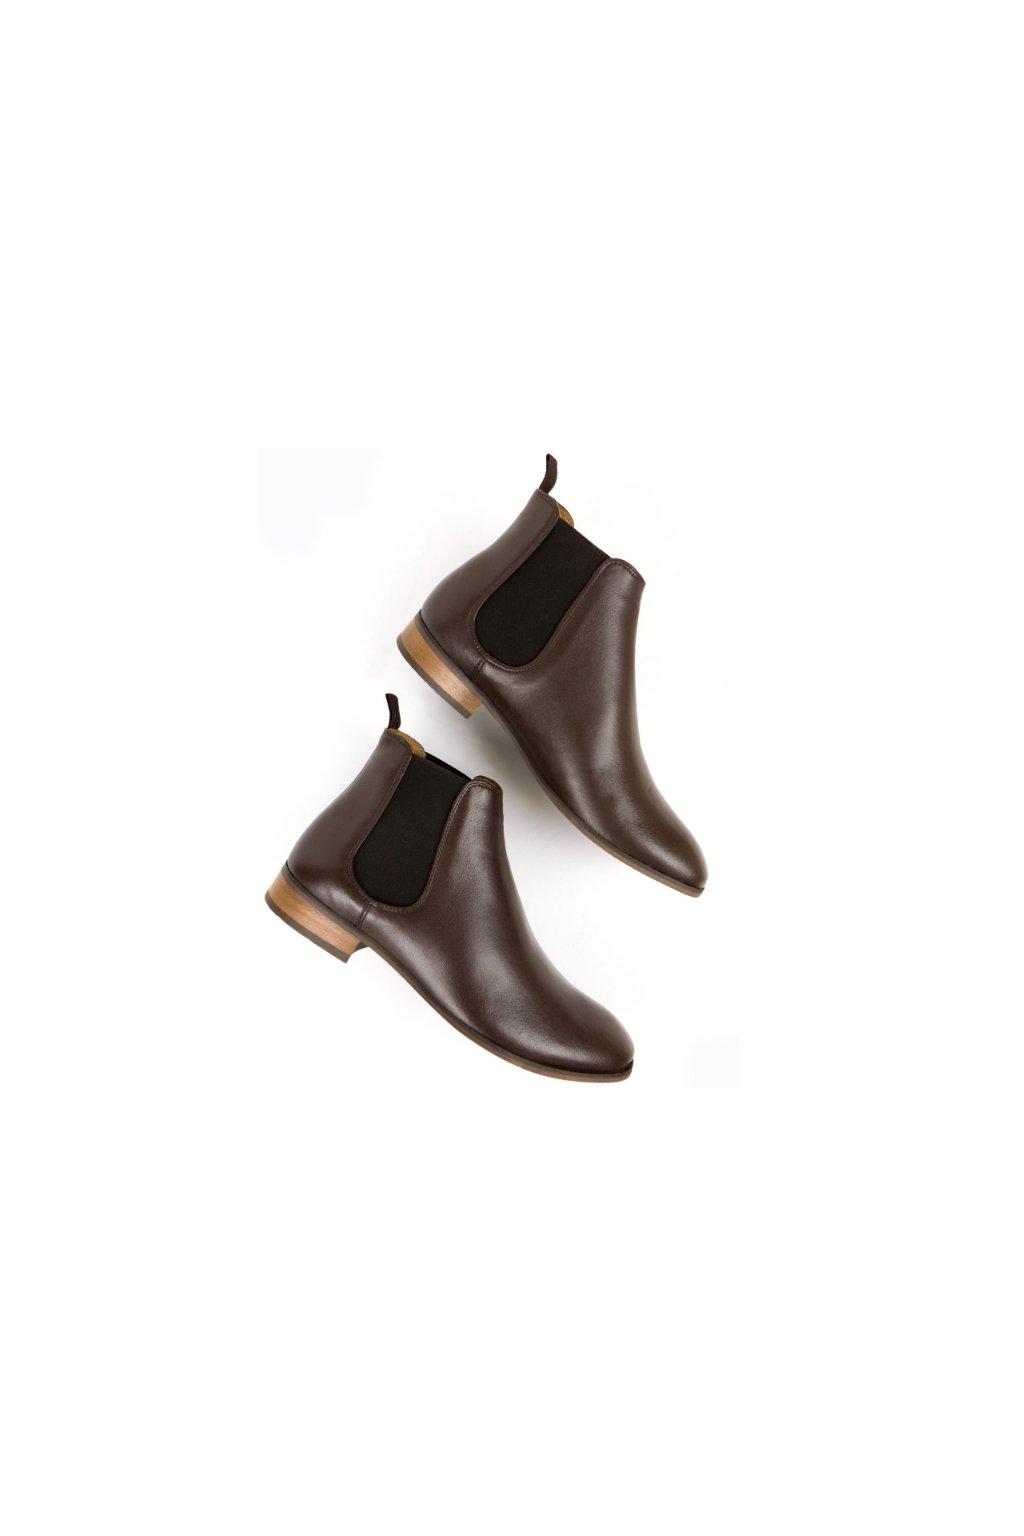 "Pánske hnedé členkové topánky z biooleja ""Chelsea Boots Dark Brown"""